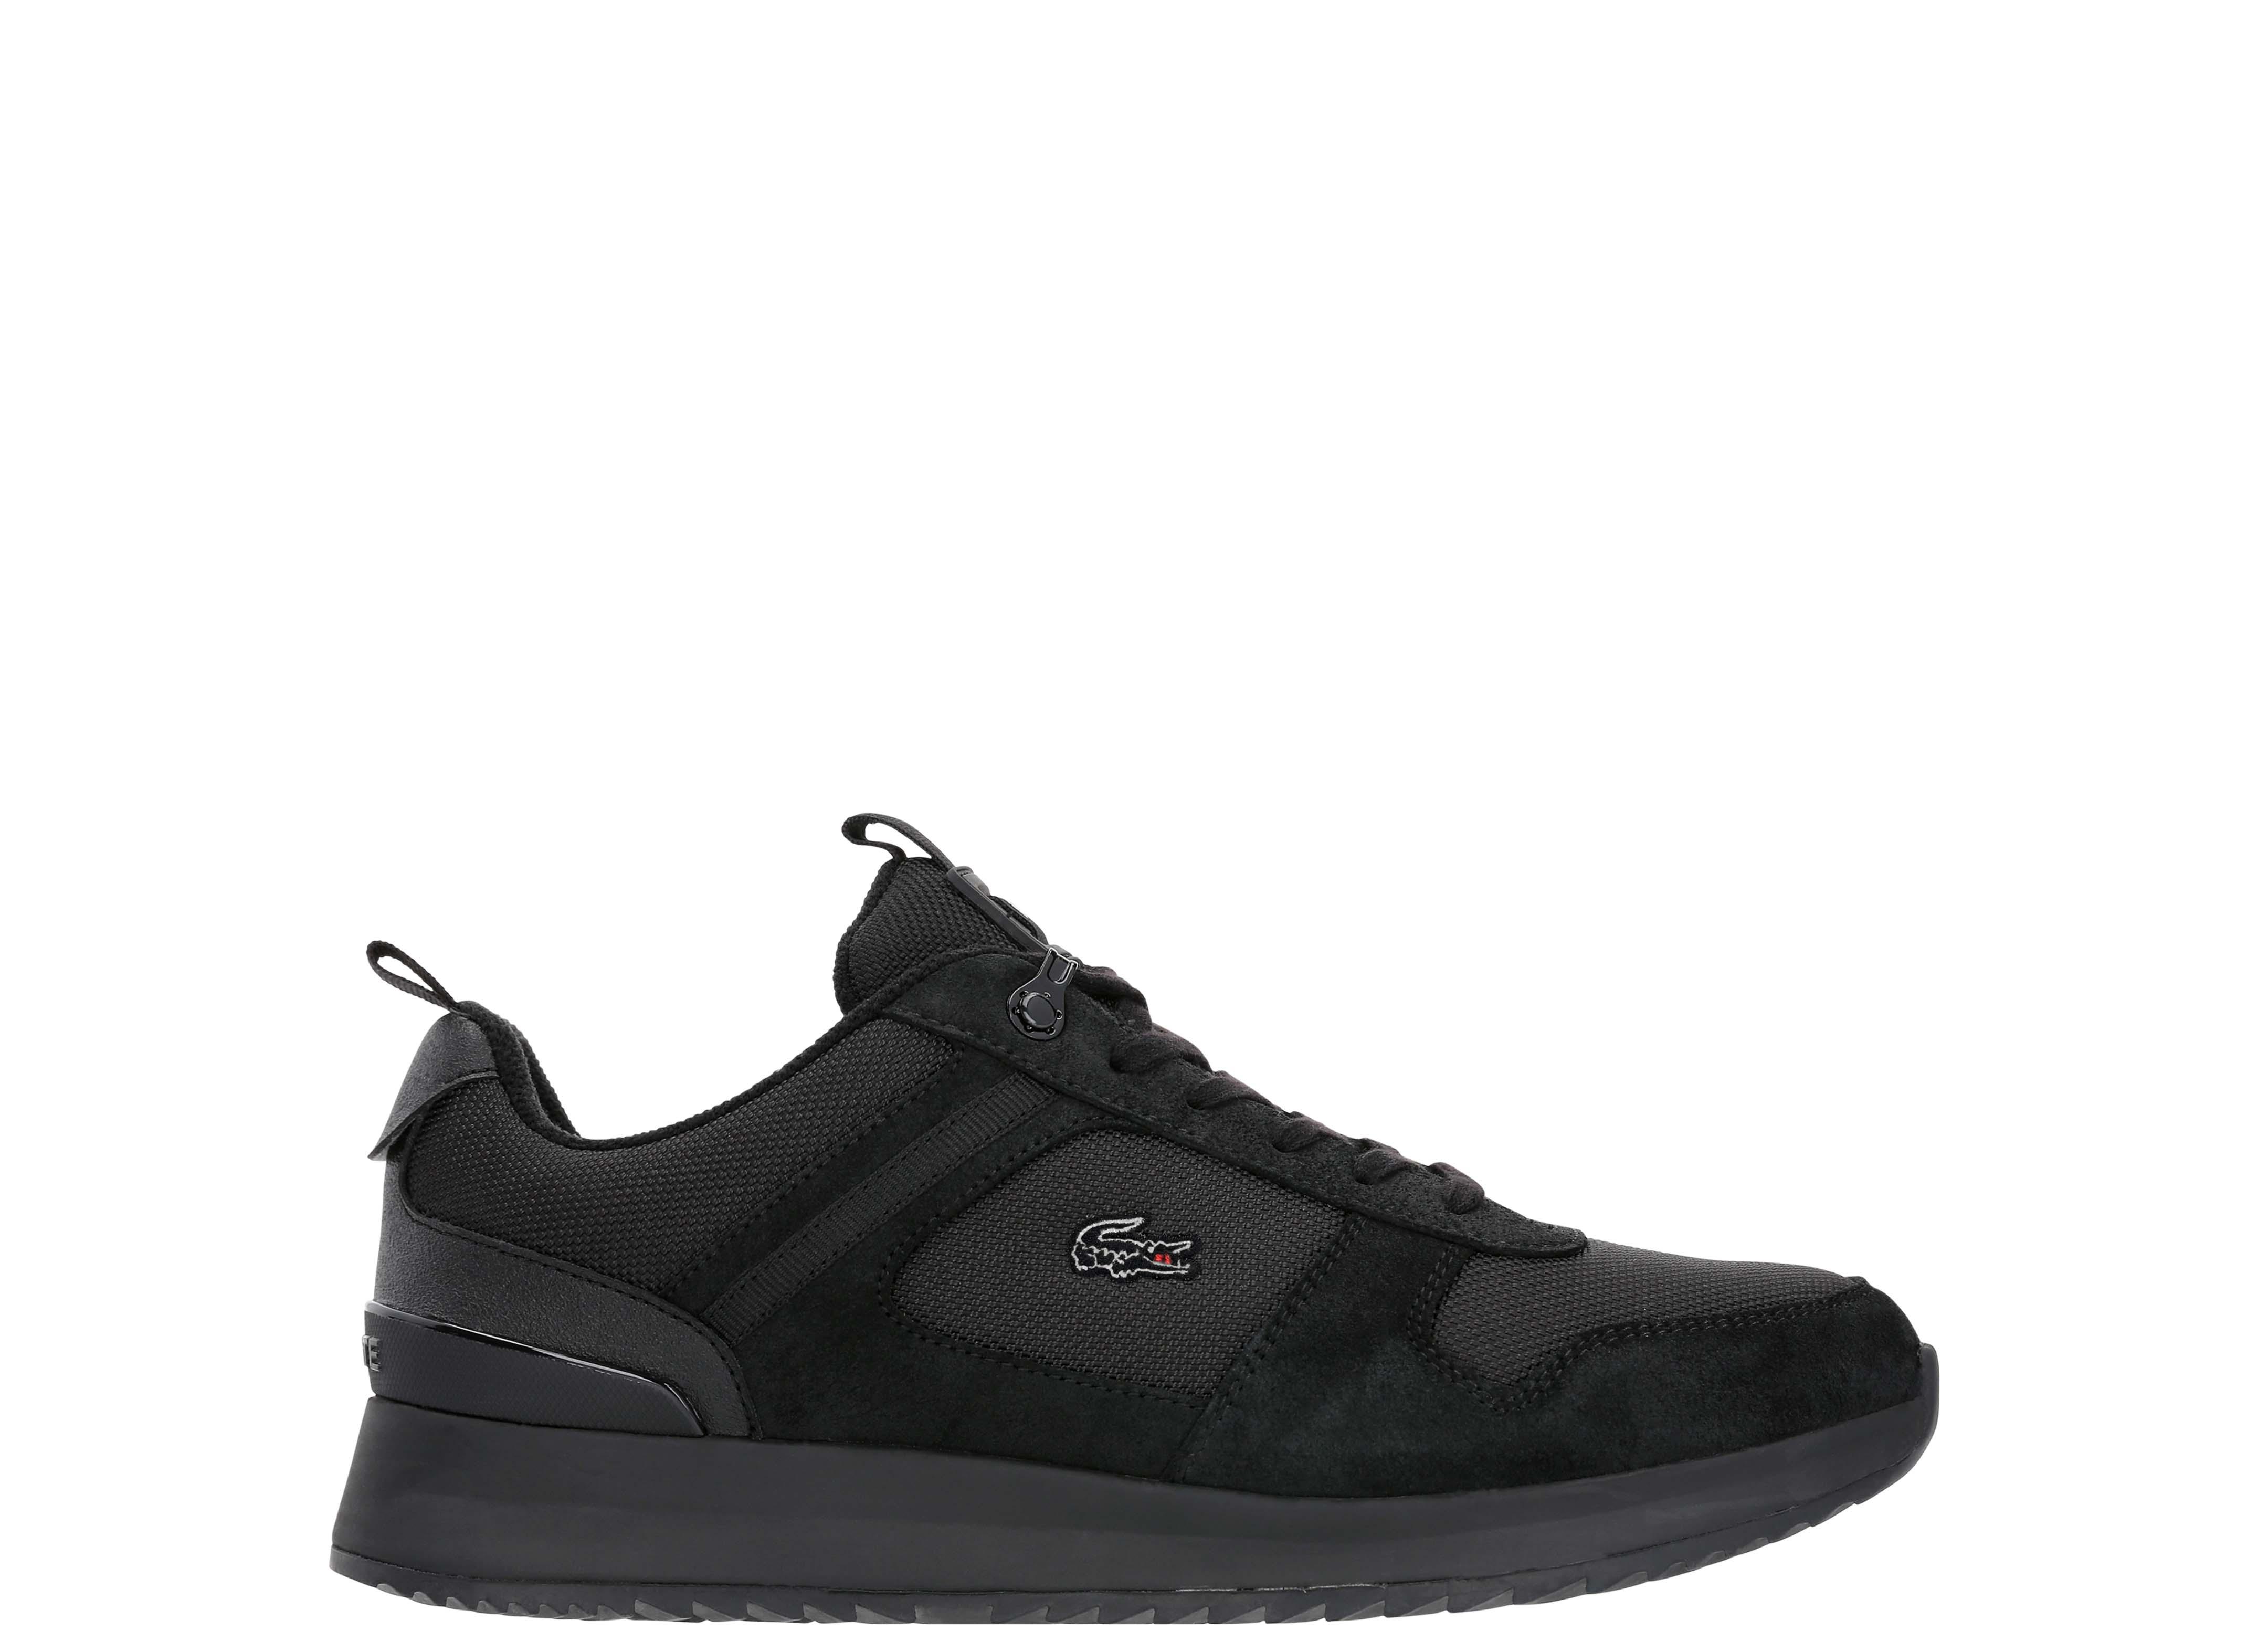 Lacoste Joggeur 2.0 sneakers, black, 45